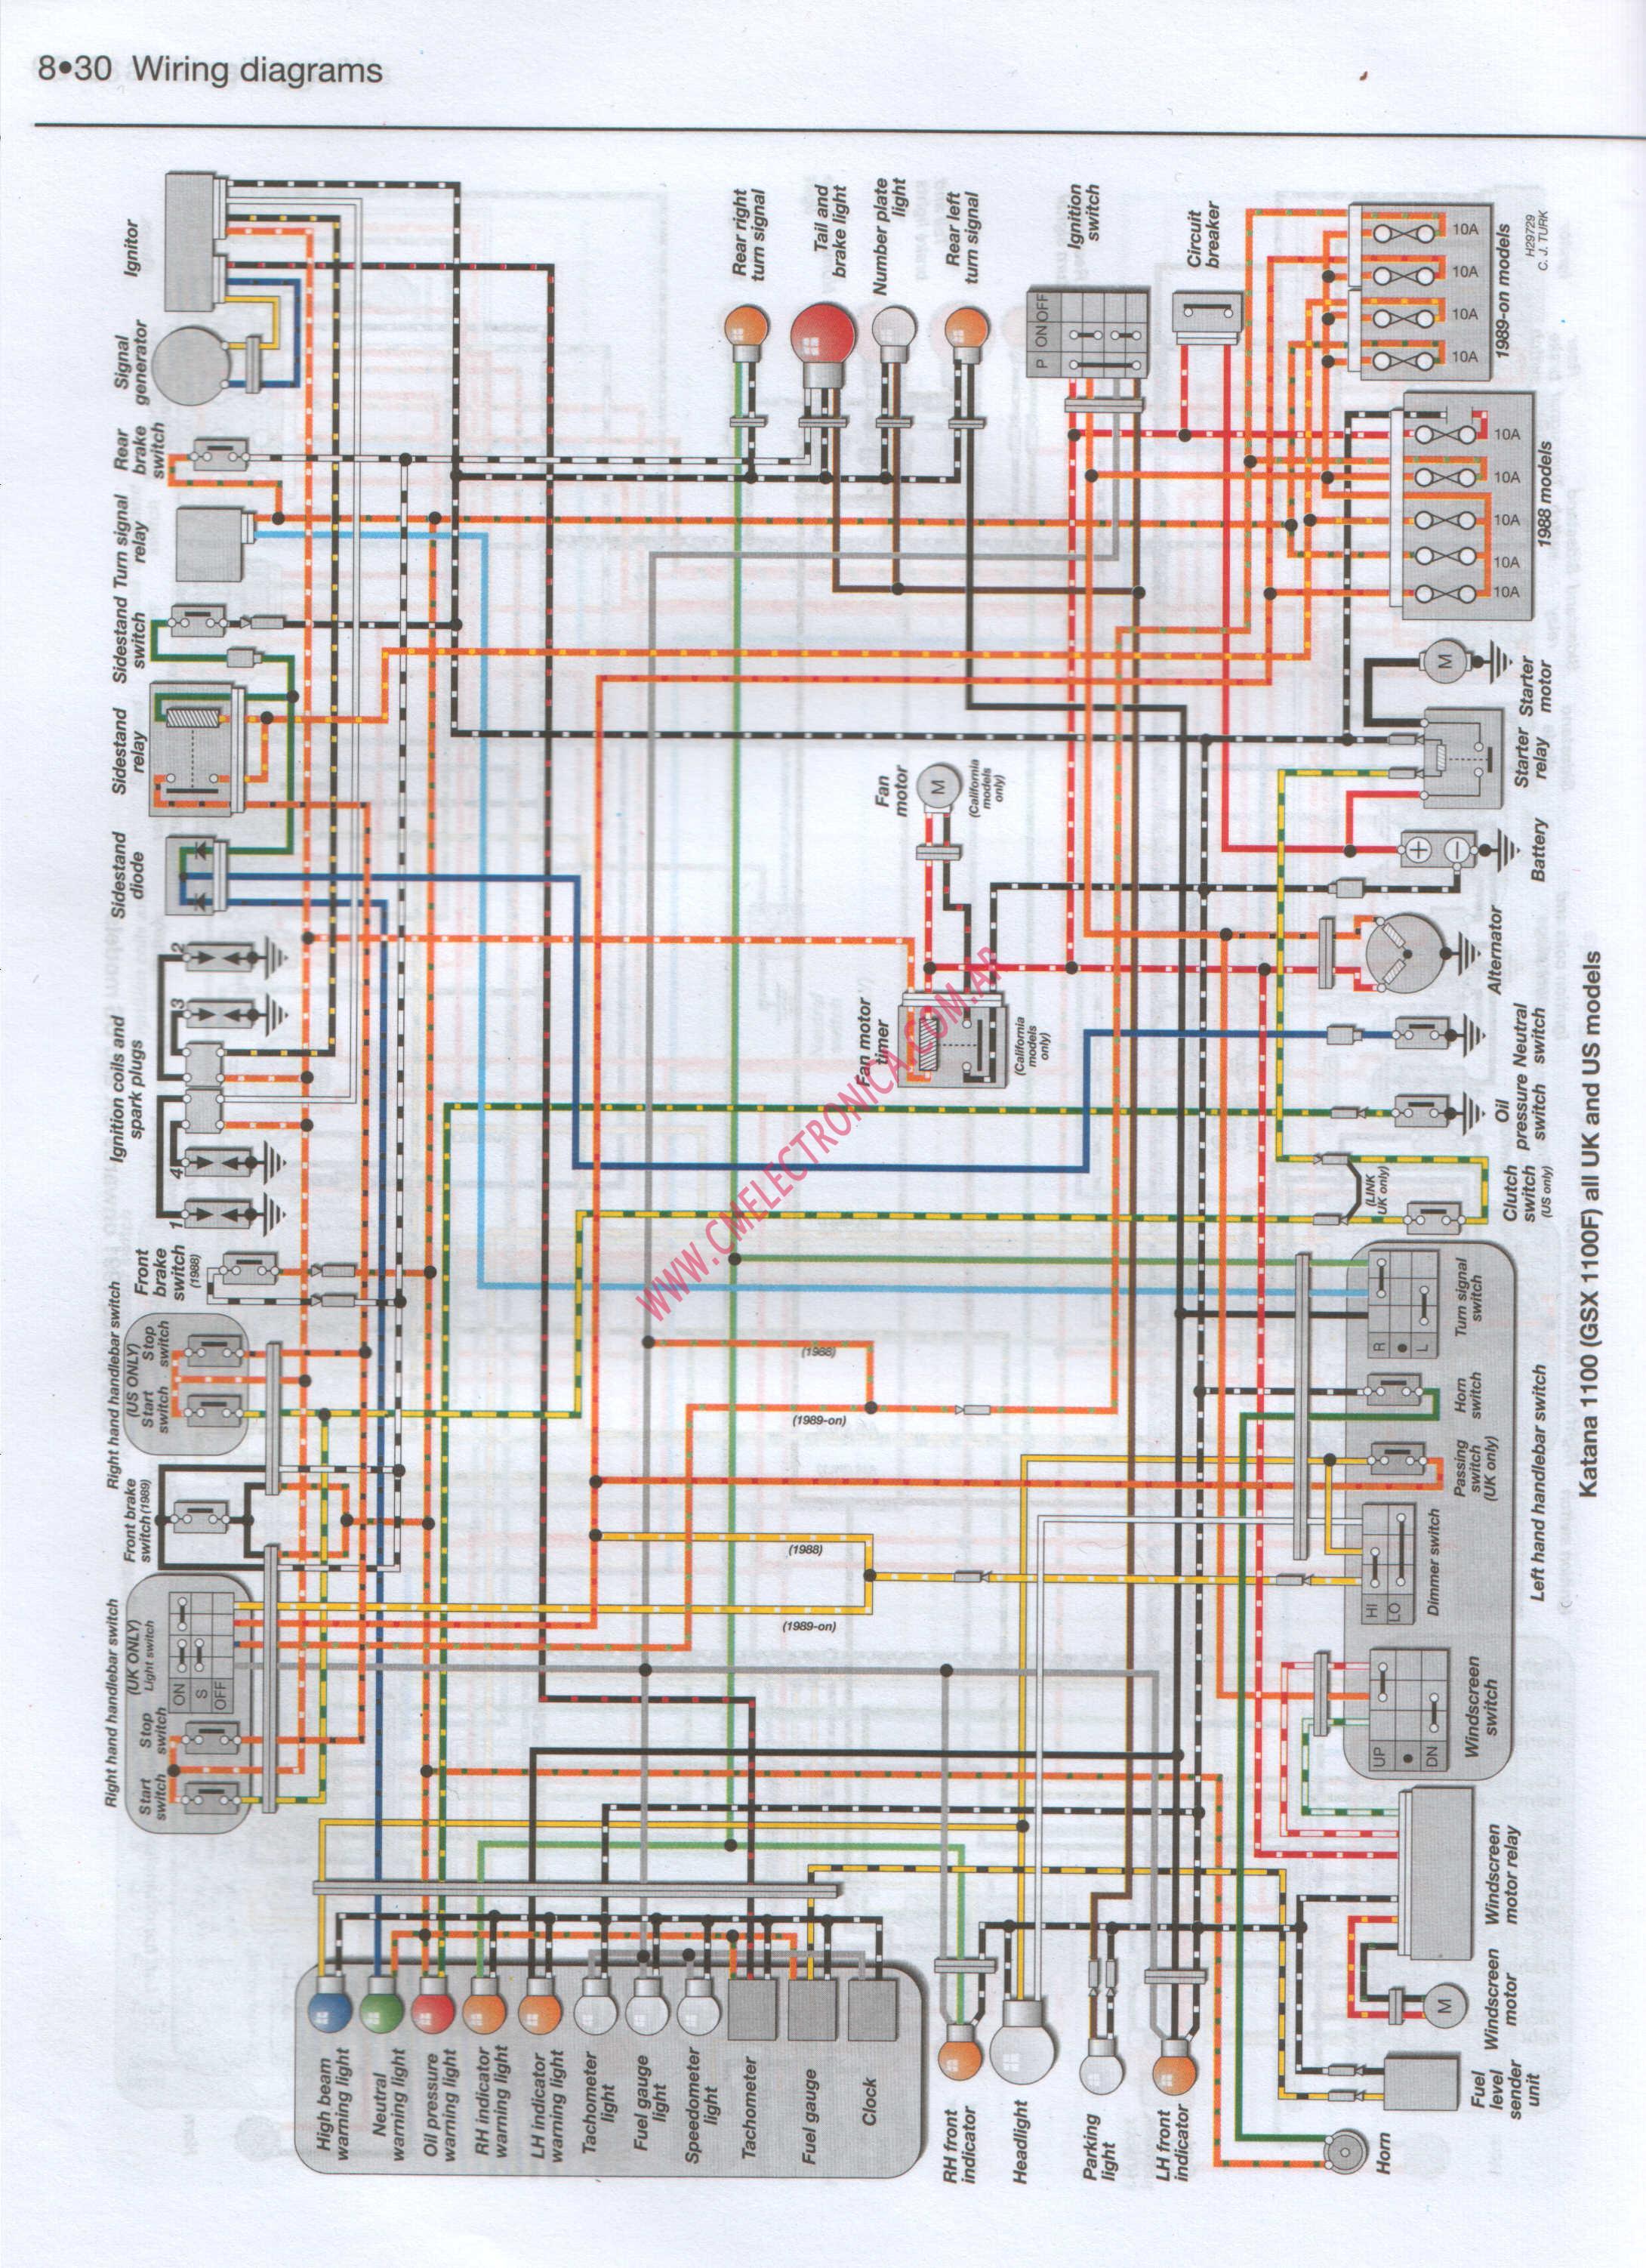 2002 yamaha virago 250 wiring diagram 2000 lincoln ls engine honda accord oil dipstick location get free image